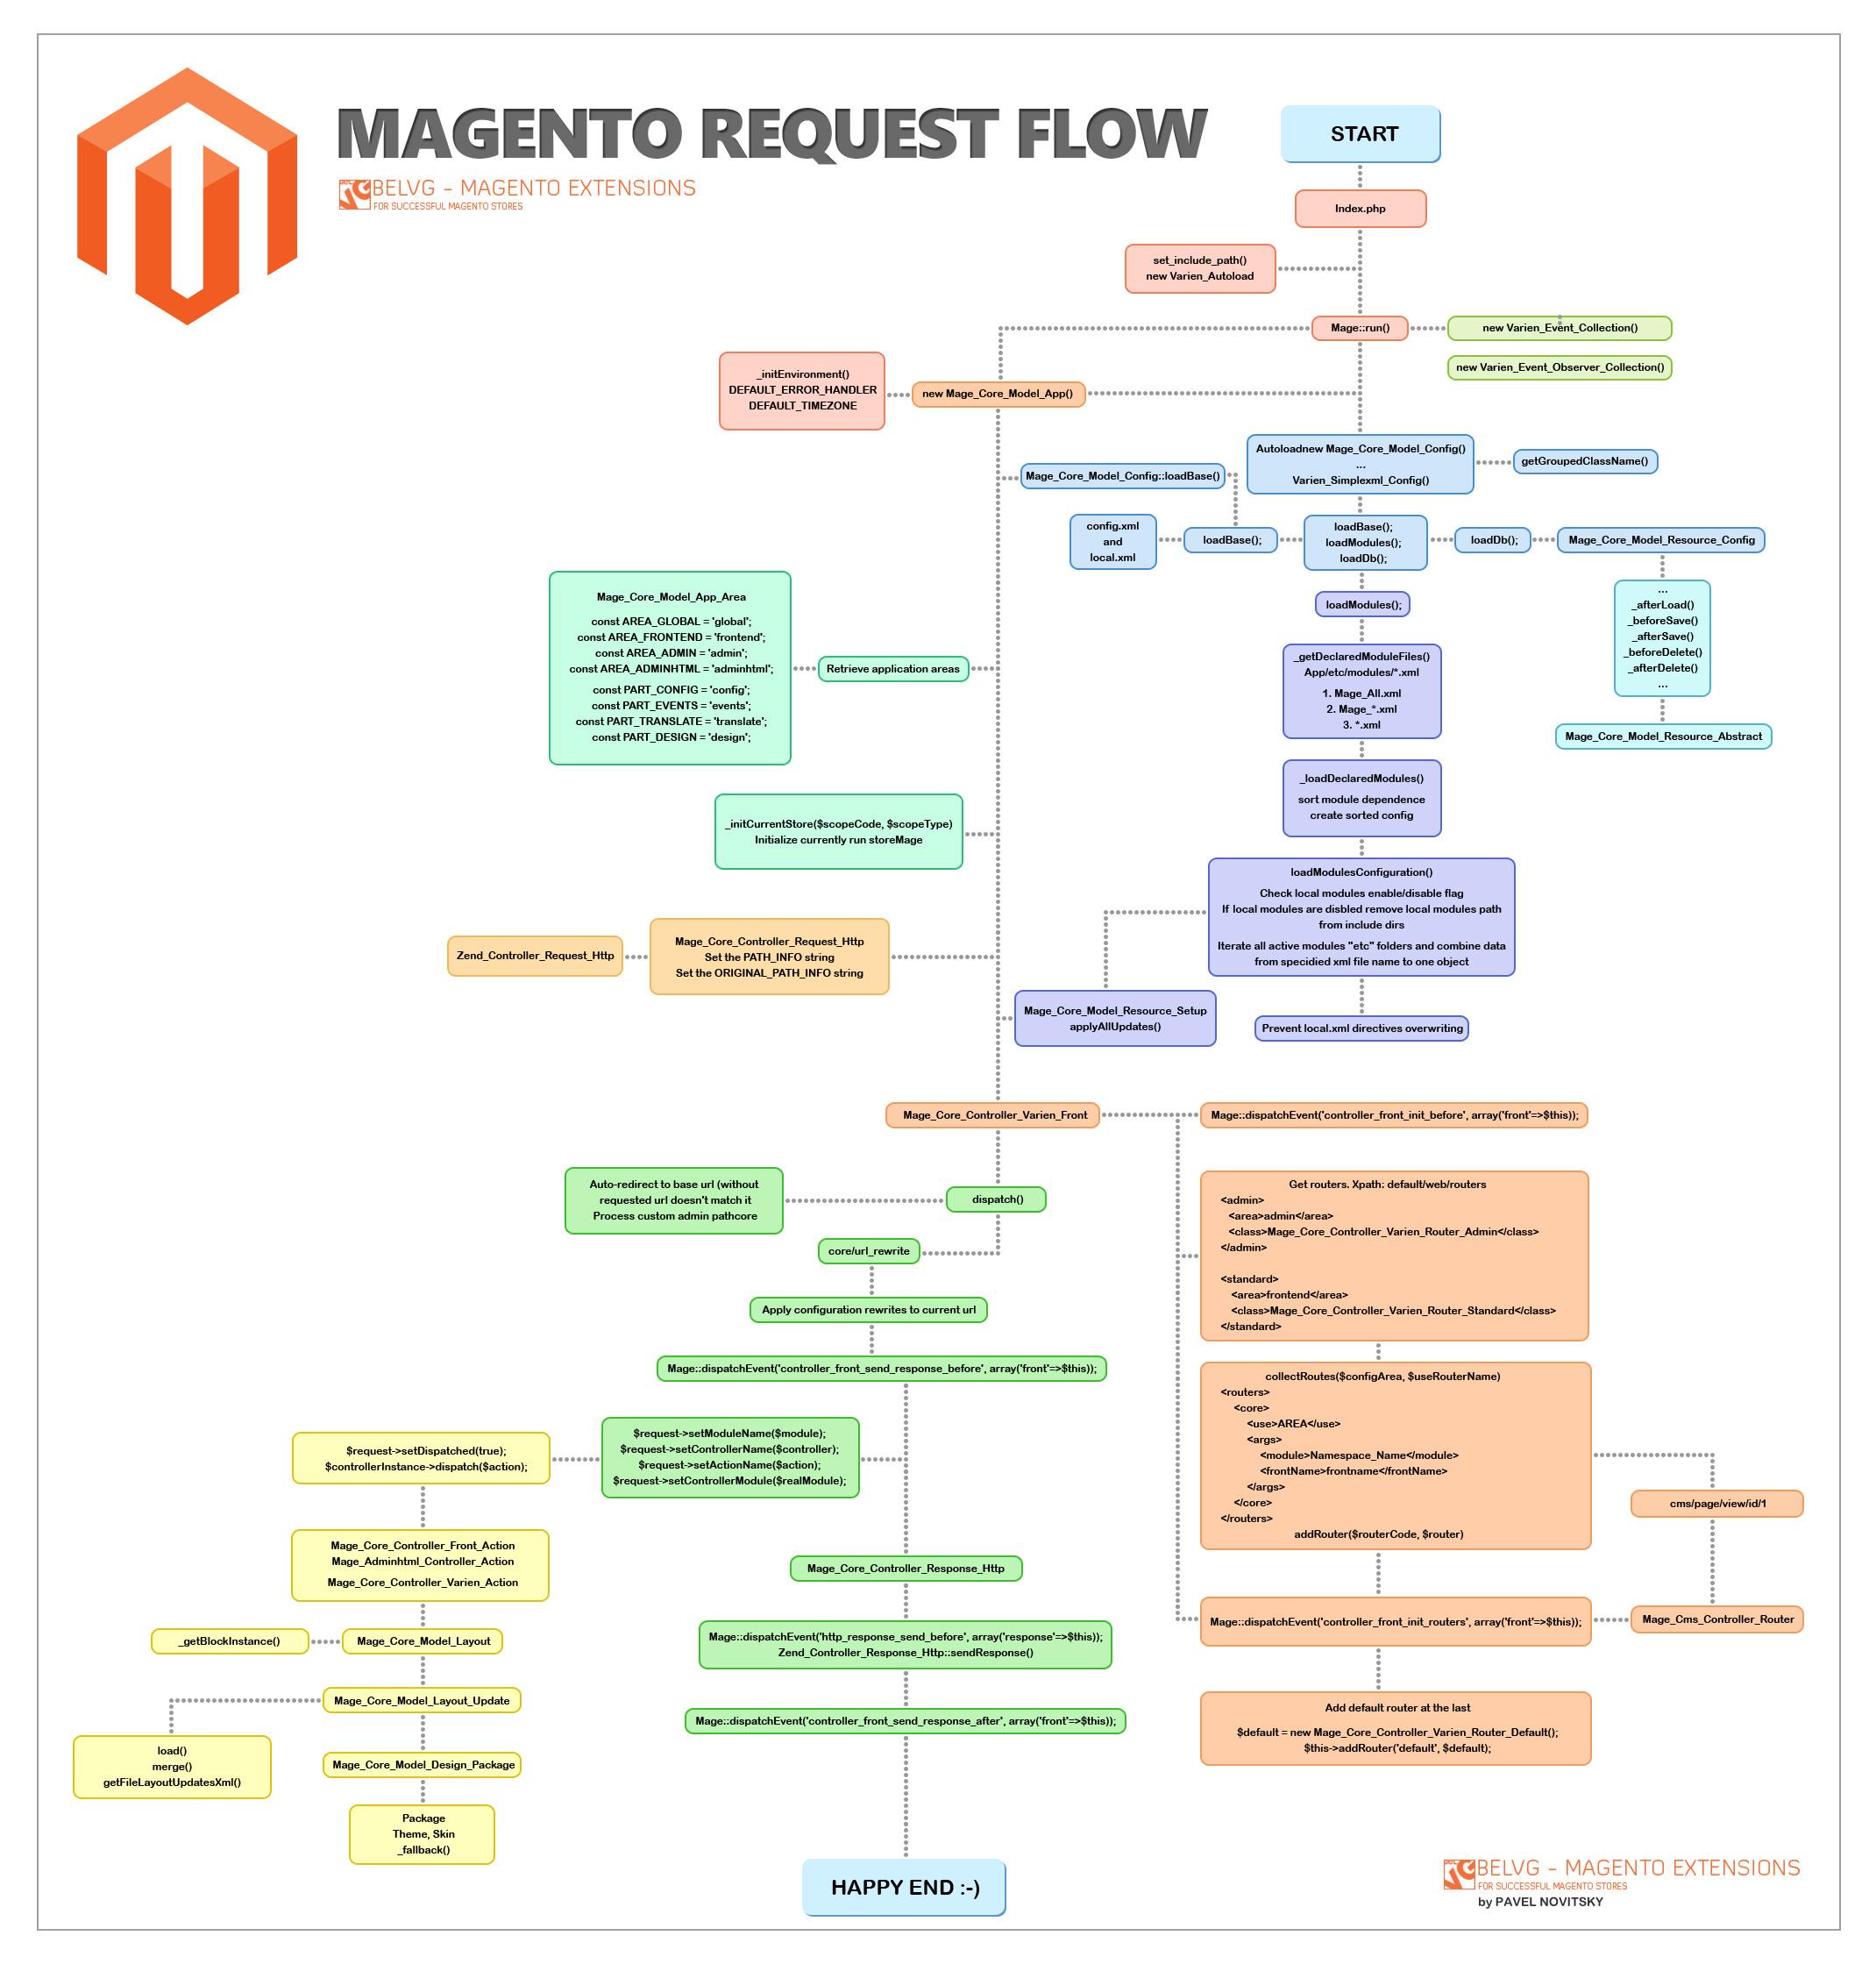 Magento request flow